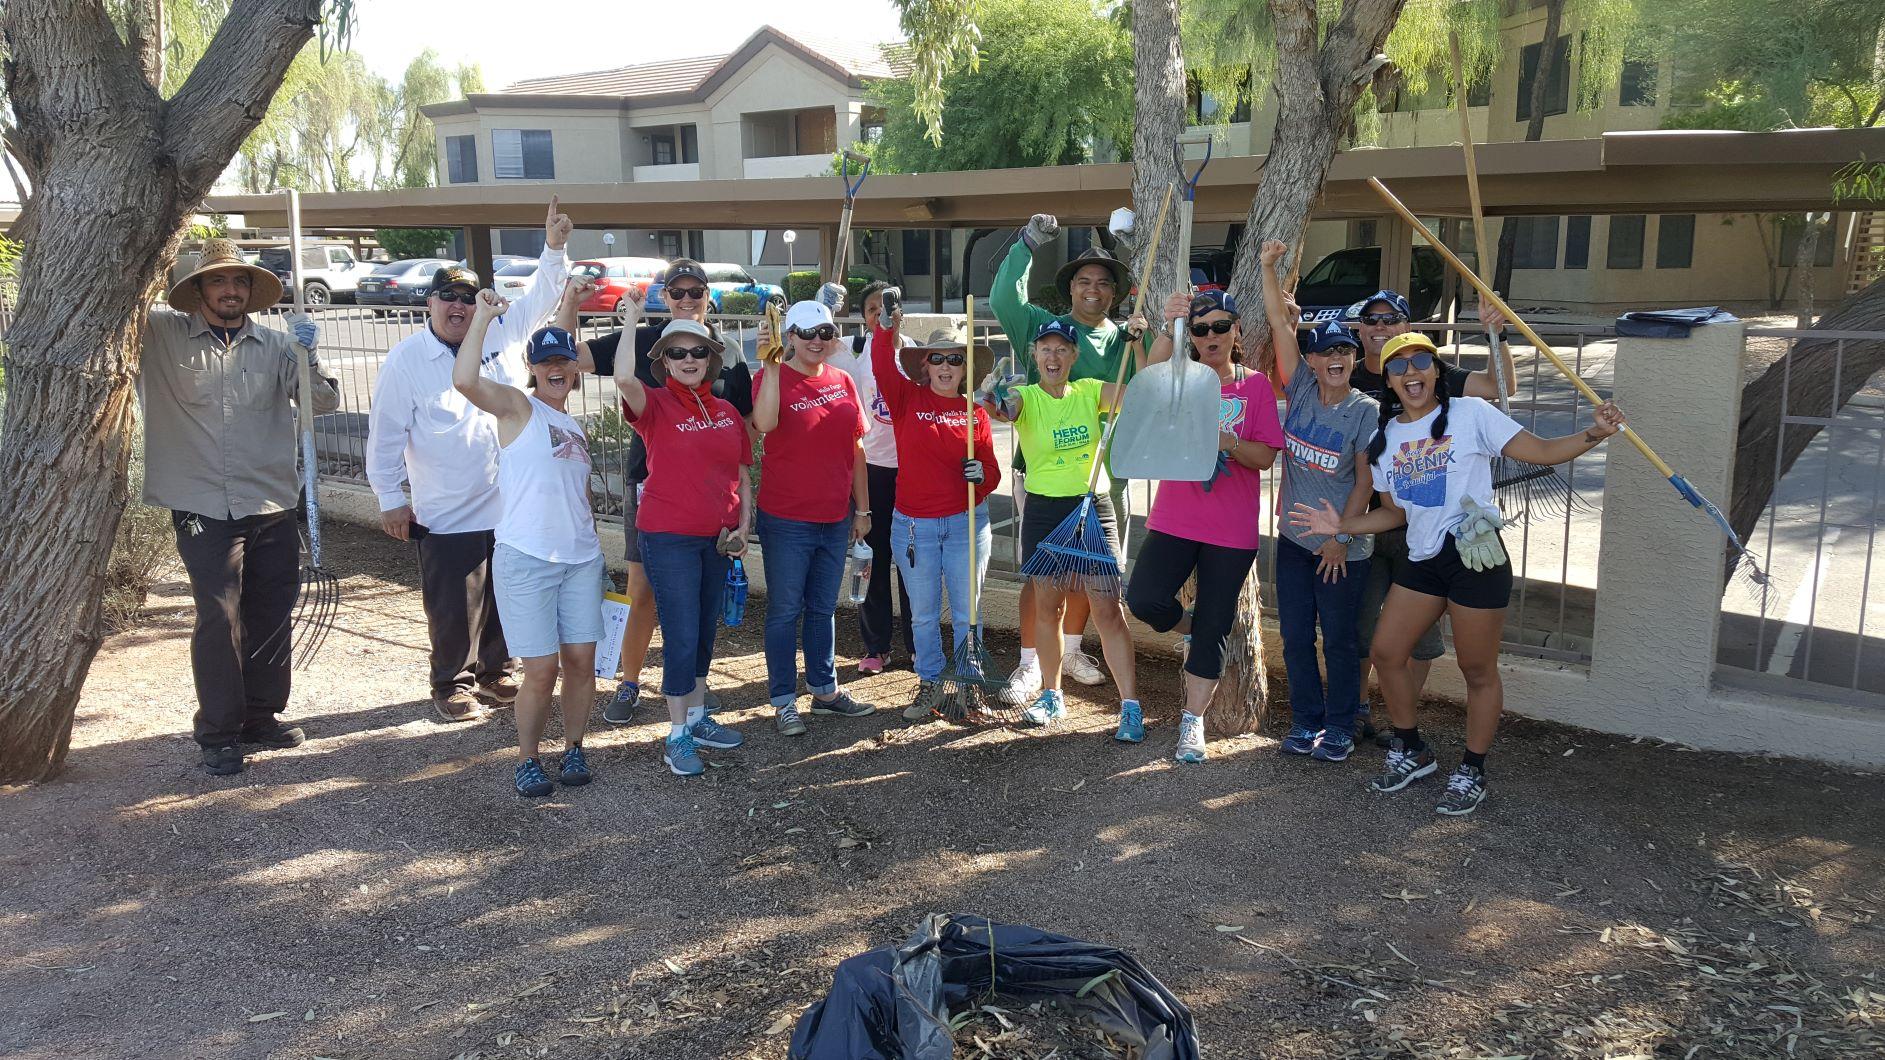 photo of HERO members and staff volunteering in a community garden